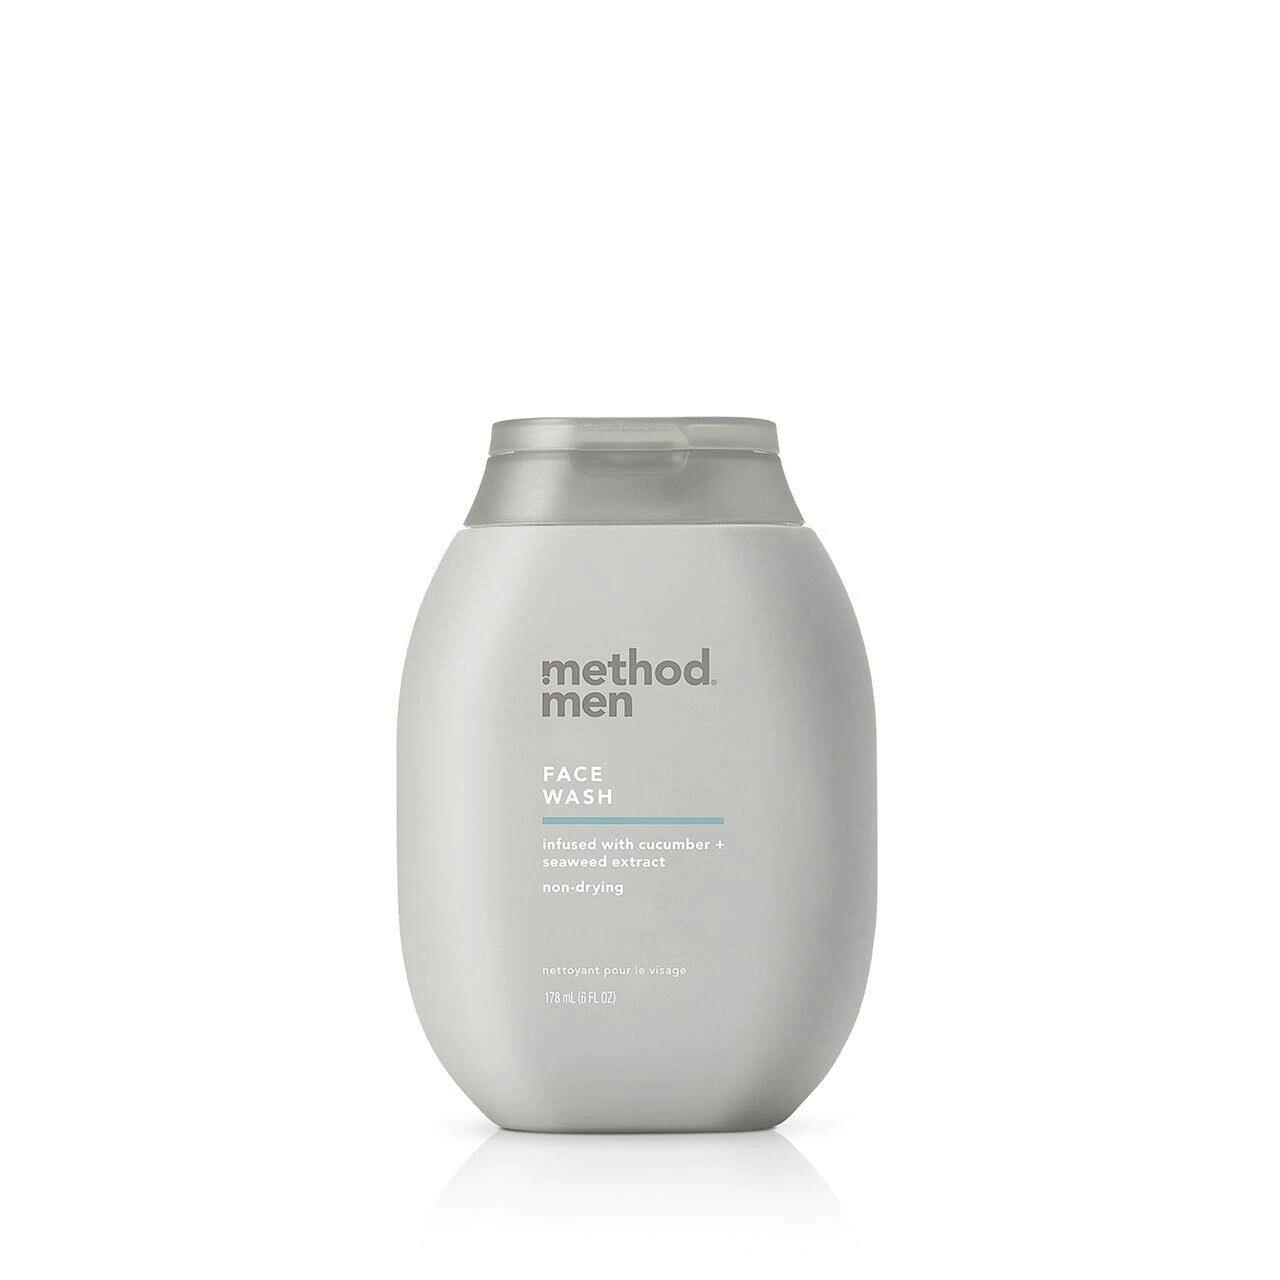 Method Men Face Wash